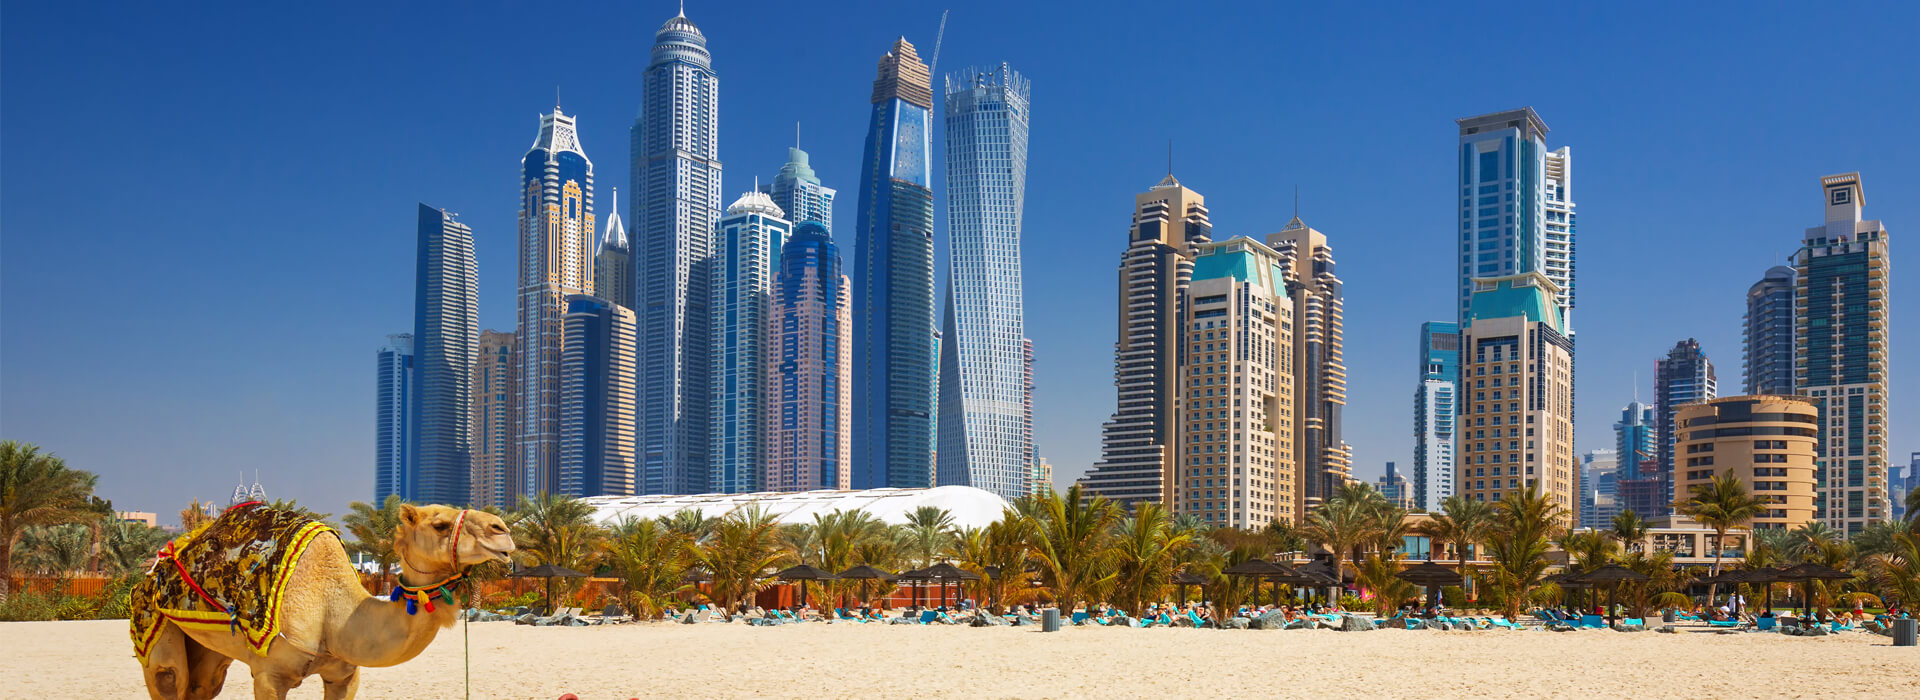 Dromedarus op het strand van Dubai